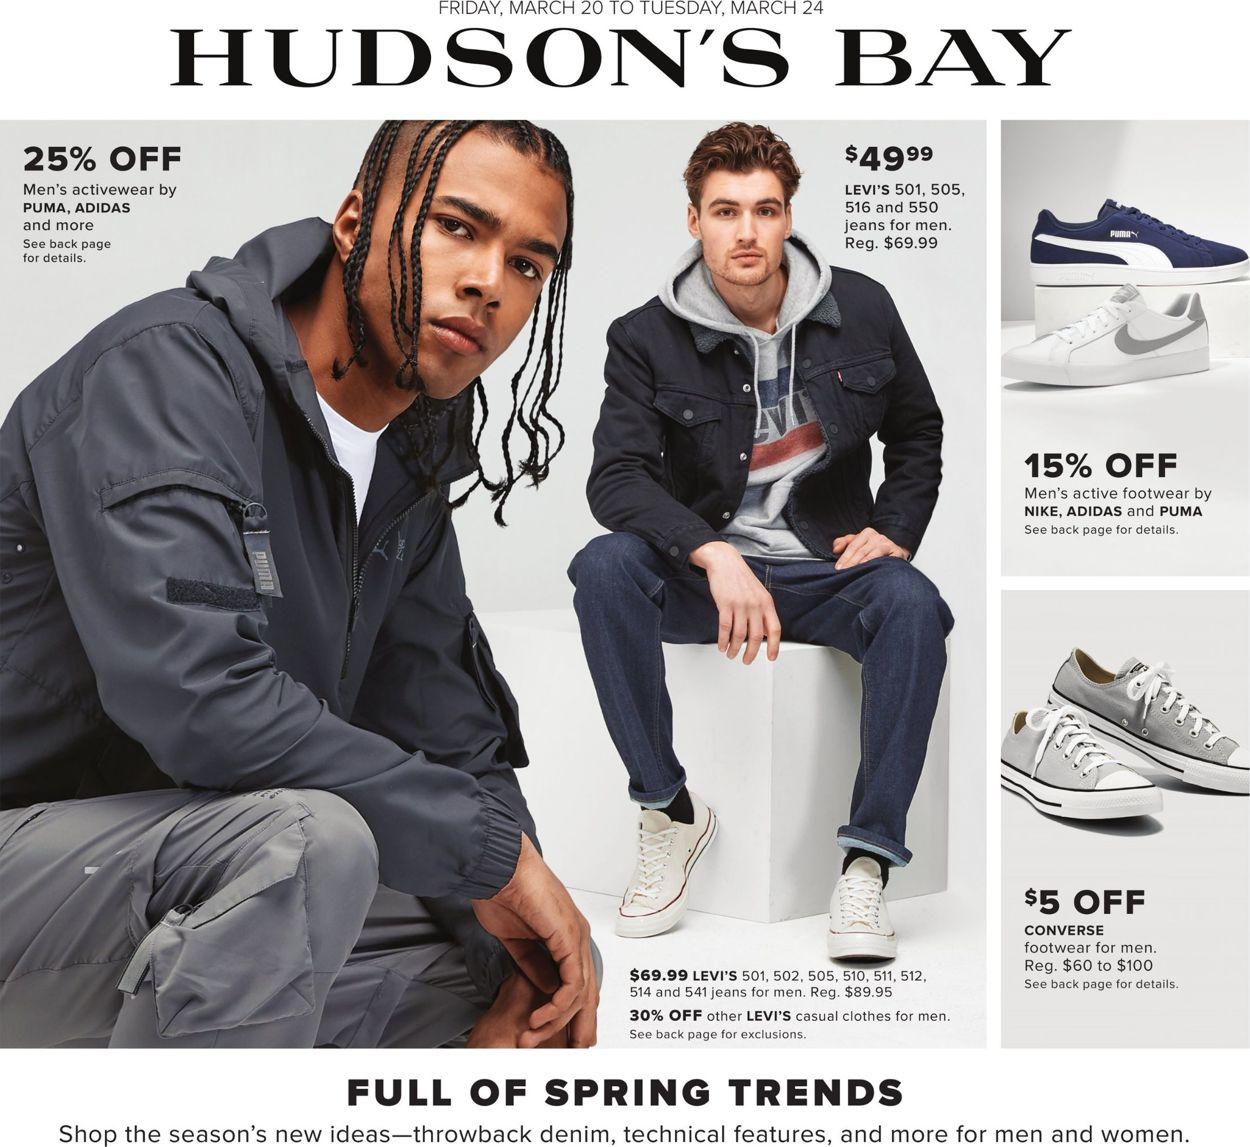 Hudson's Bay Flyer - 03/20-03/24/2020